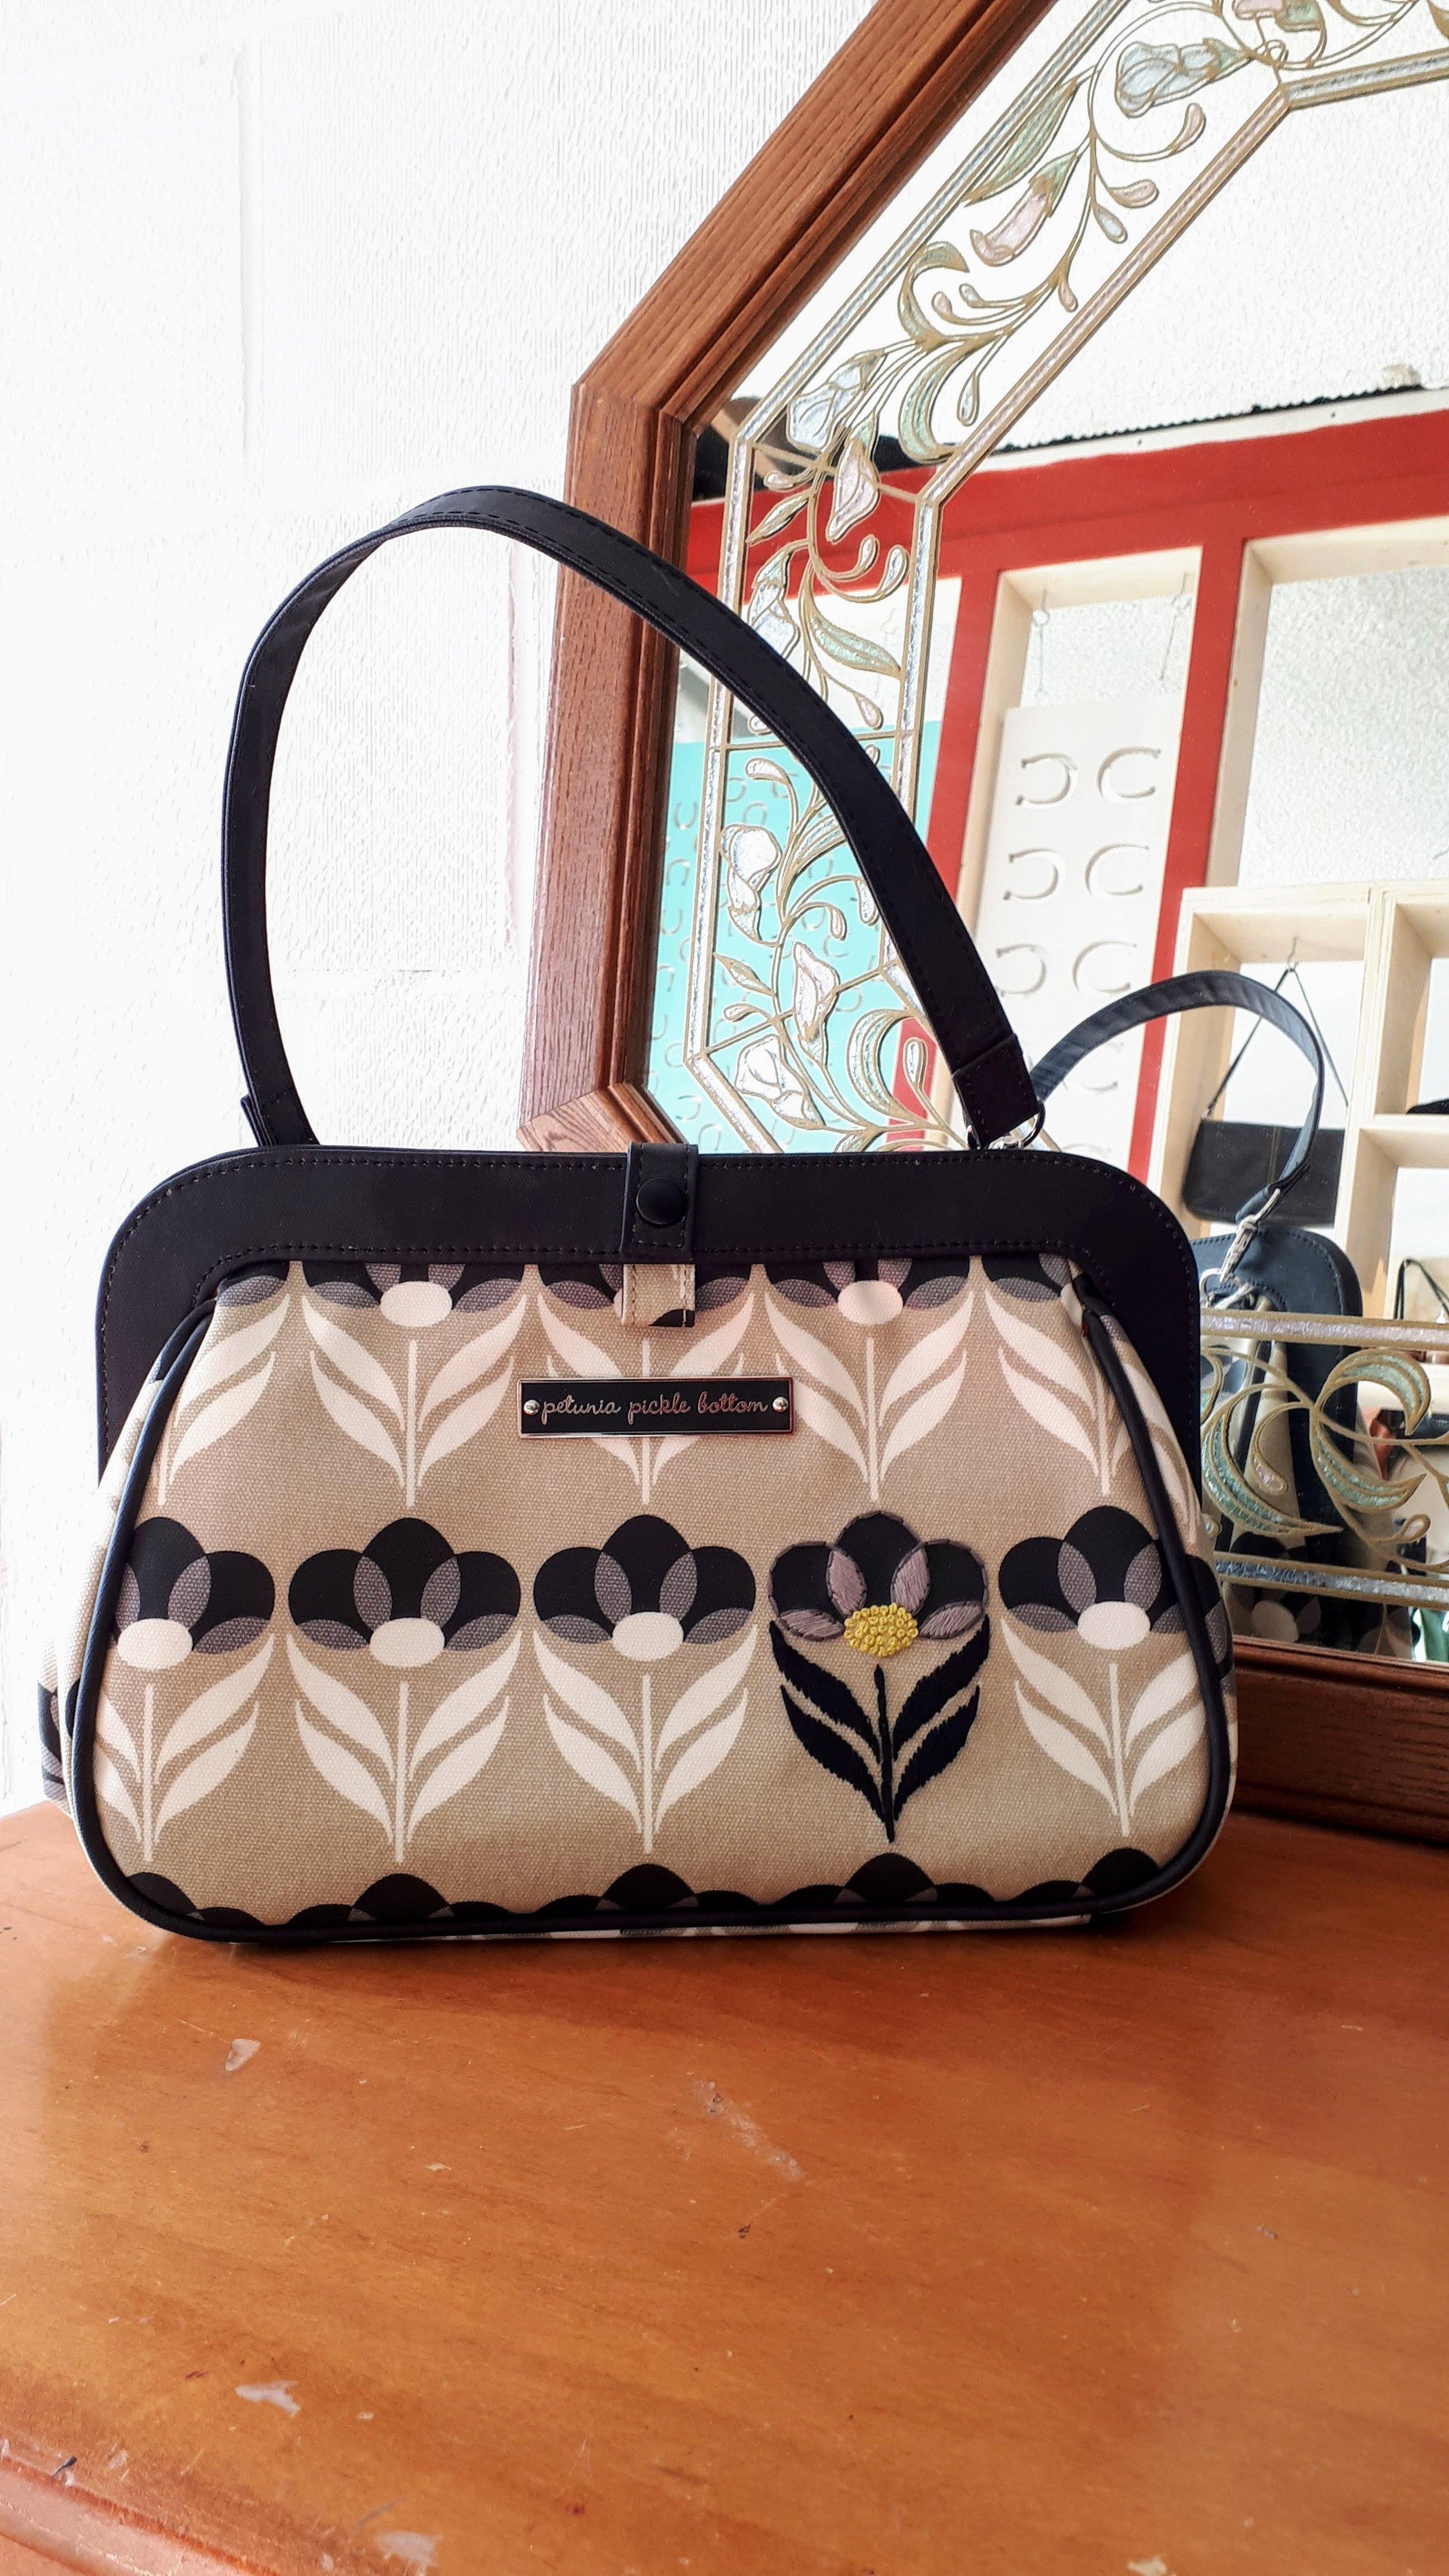 Petunia Pickle Bottom purse (NWT), $45